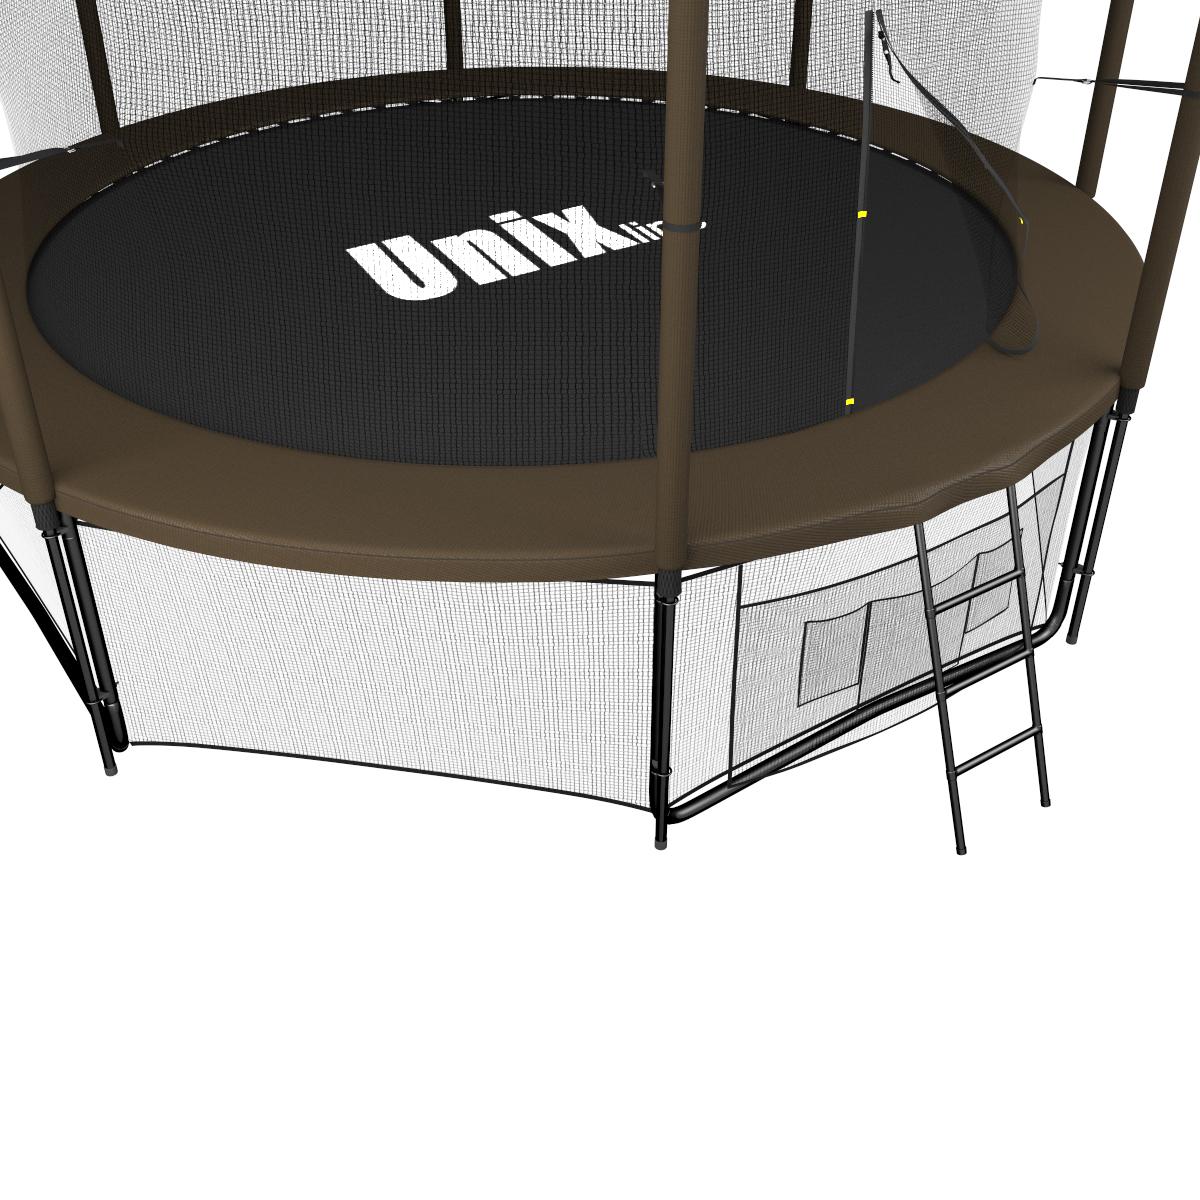 Батут UNIX line Black&Brown 12 ft (inside)